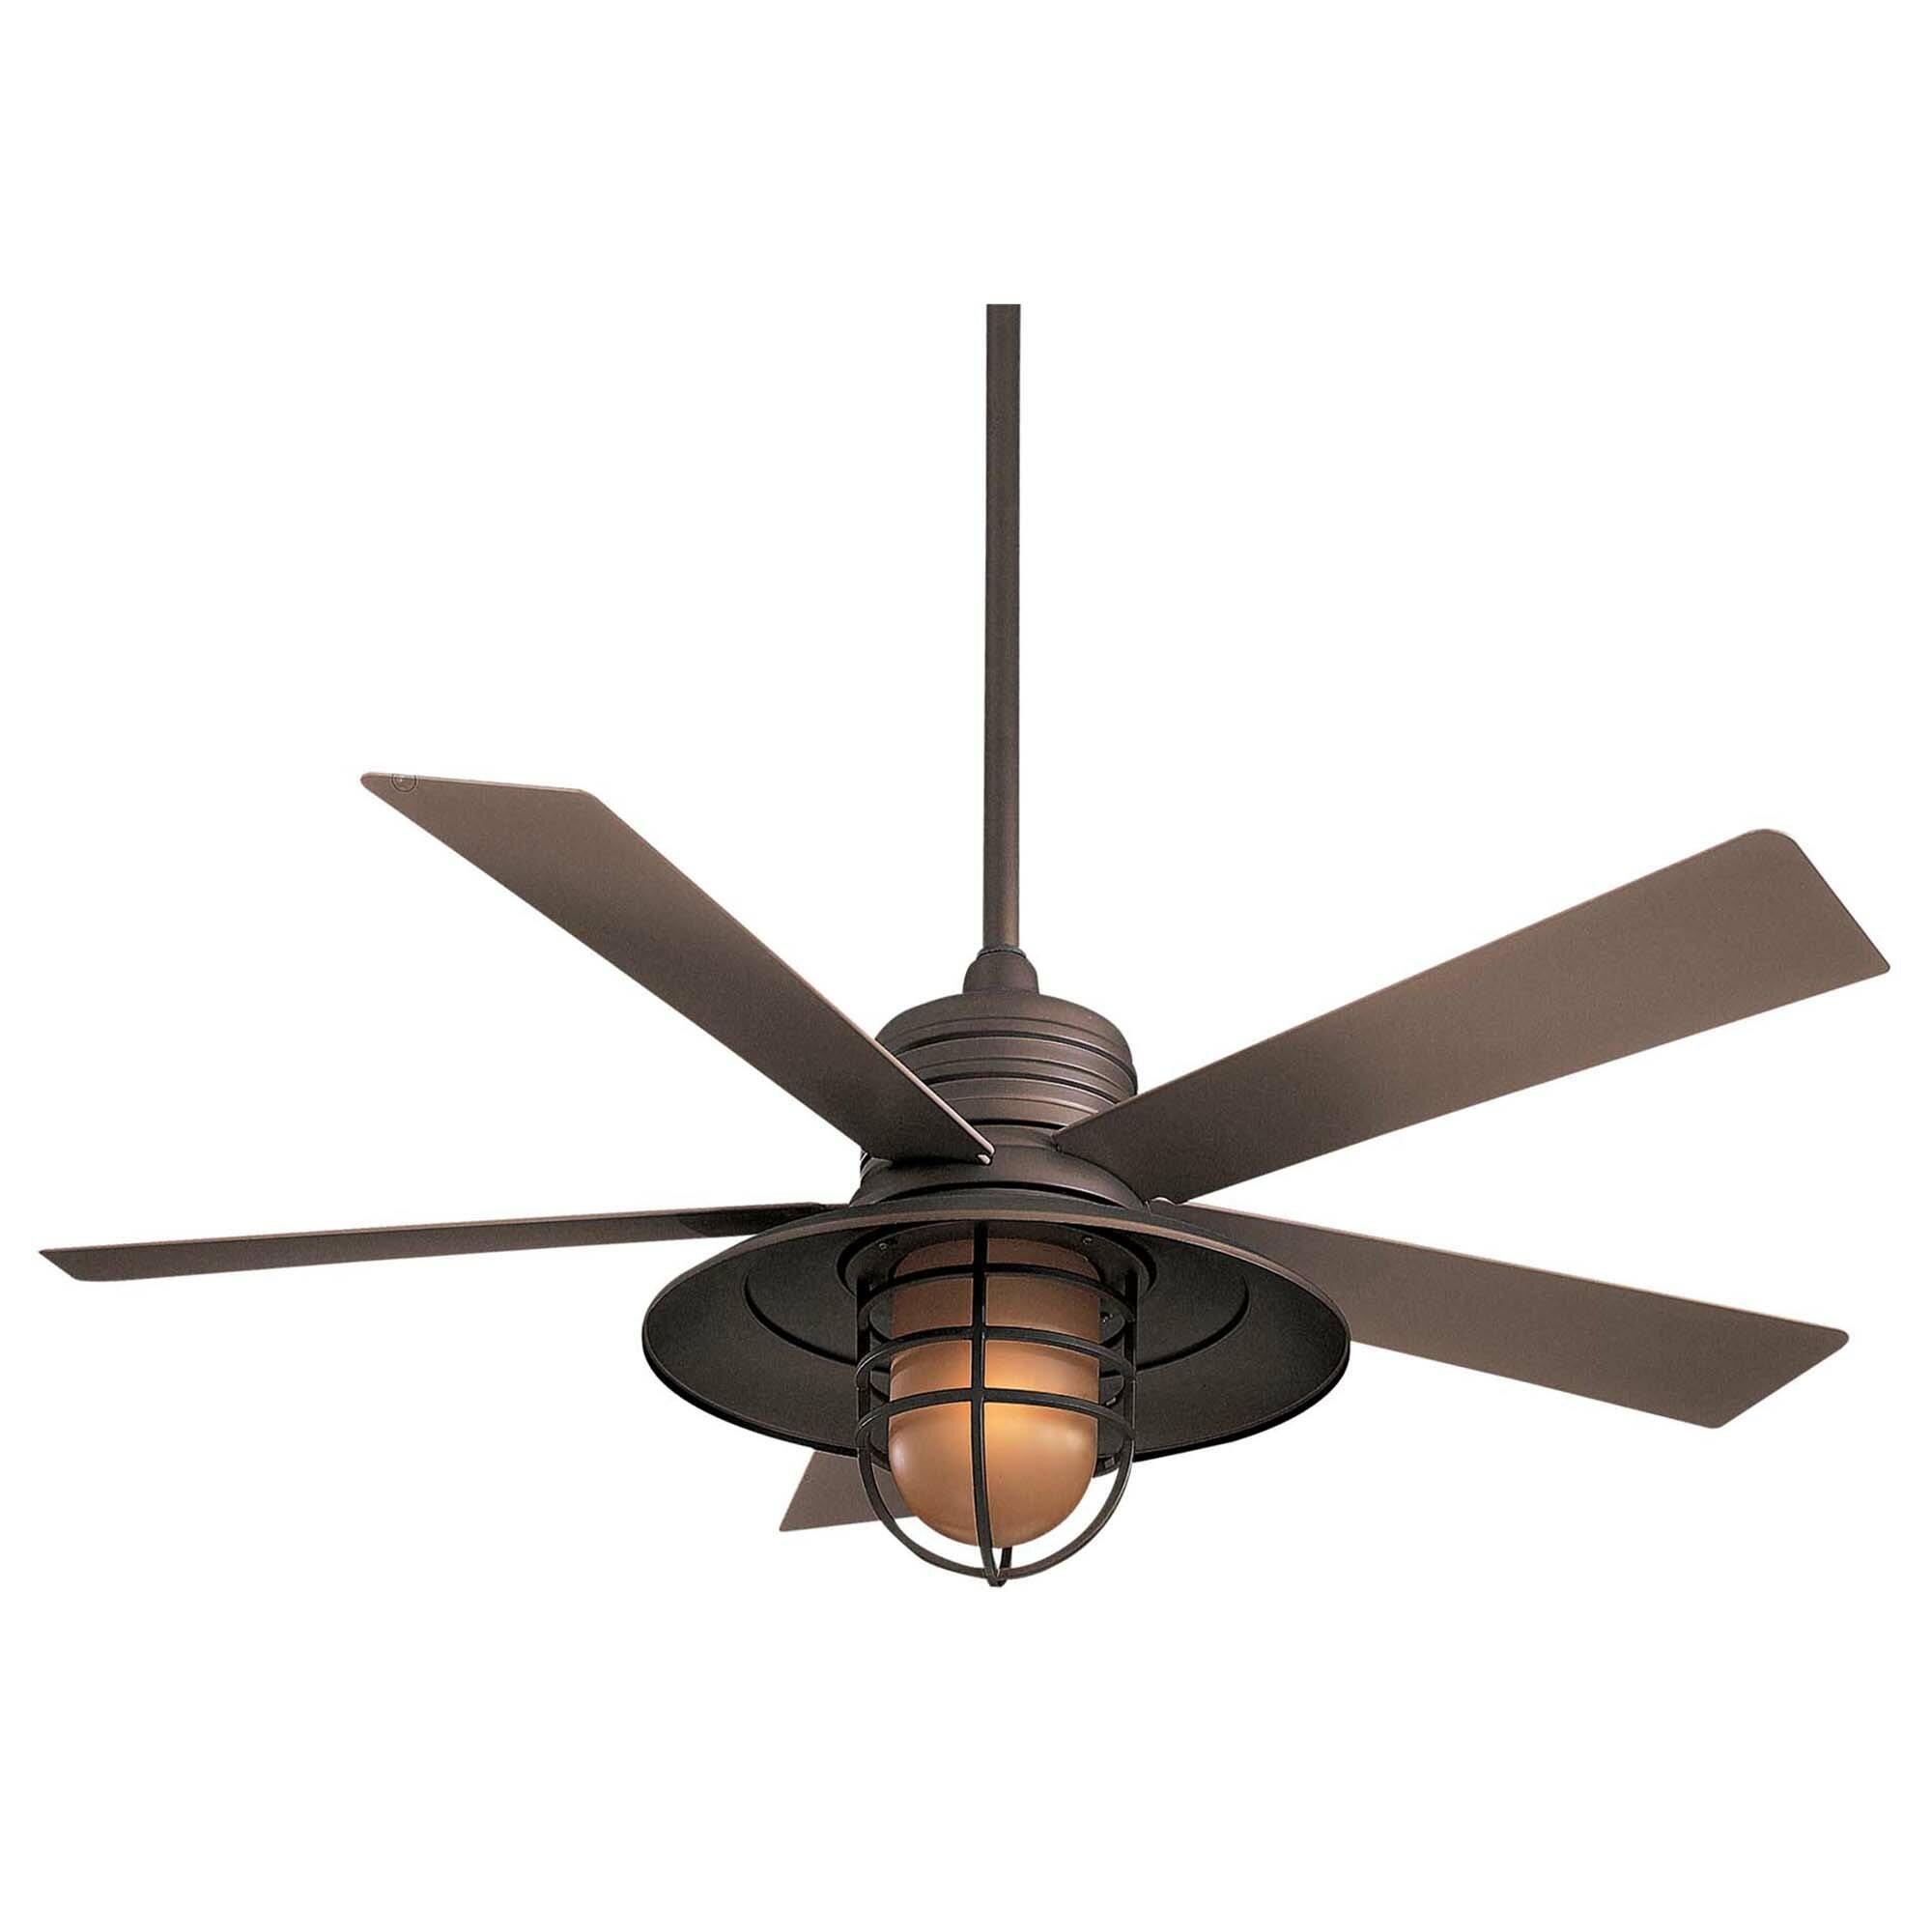 "Minka Aire 54"" RainMan 5-Blade Indoor / Outdoor Ceiling Fan ..."